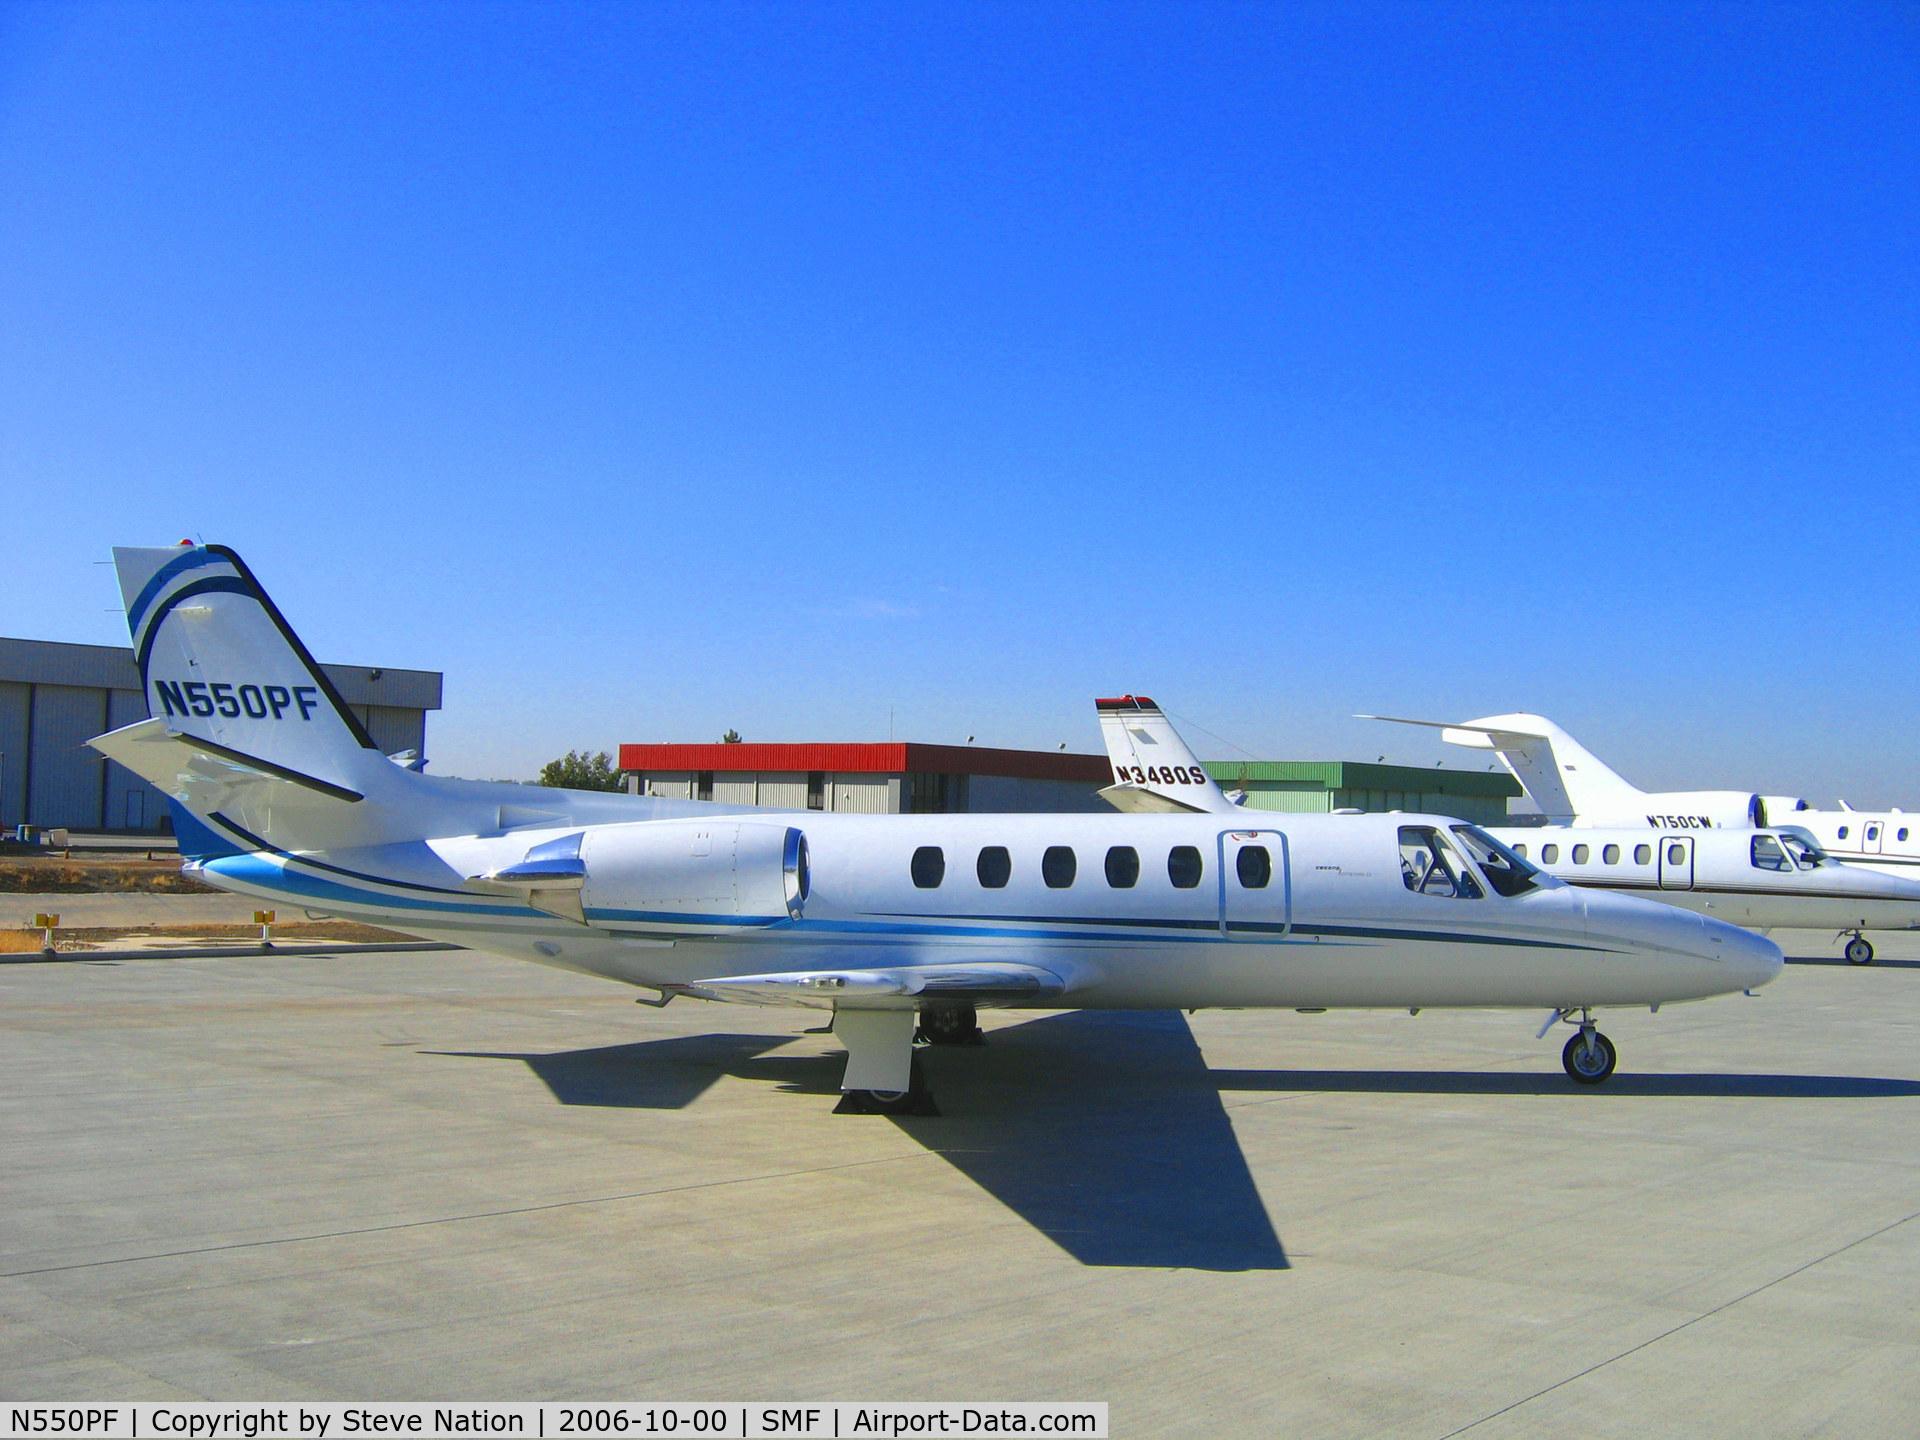 N550PF, 1982 Cessna 550 C/N 550-0428, Chancellor Services Inc. (Grants Pass, OR) 1982 Cessna 550 @ Sacramento Metro Airport, CA